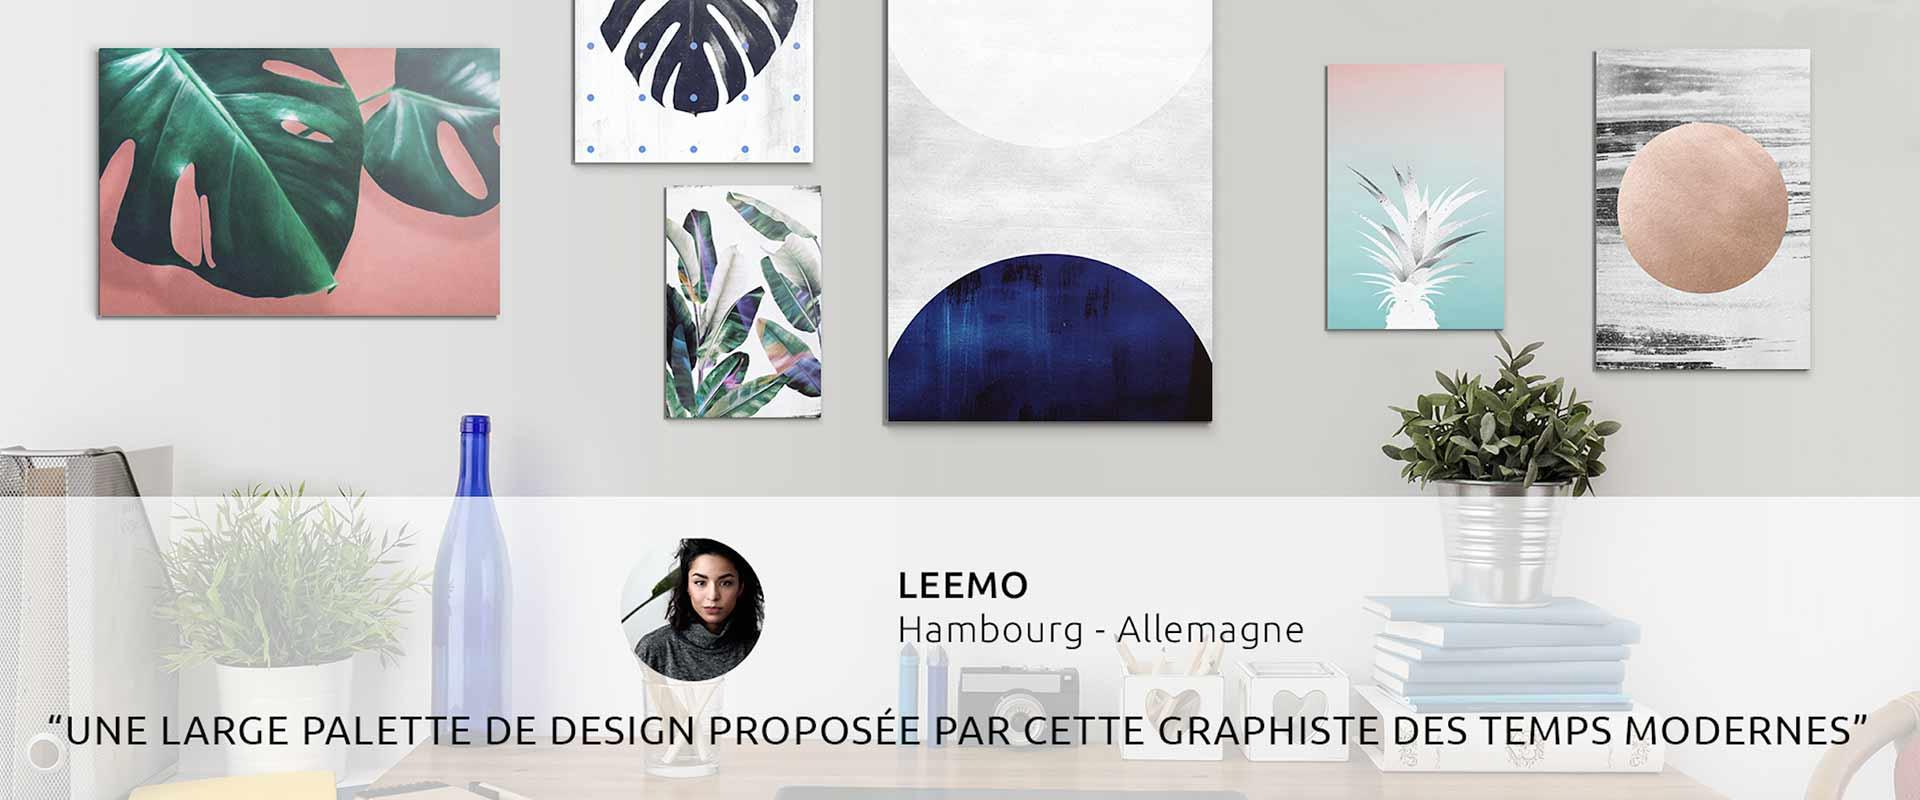 Artiste Leemo